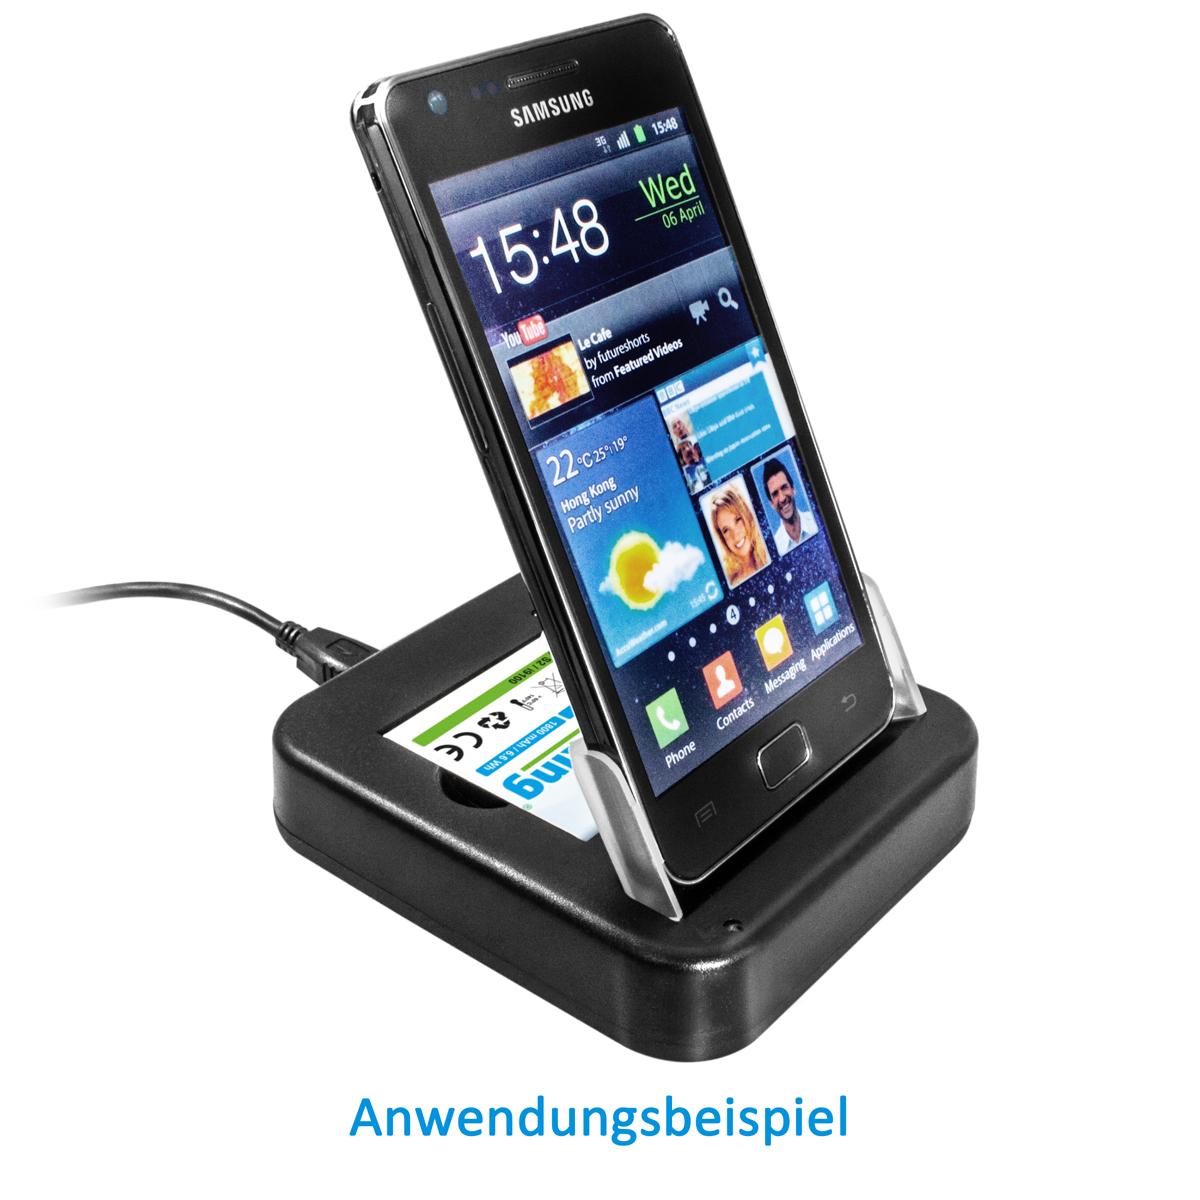 usb dockingstation akku ladeger t f r samsung galaxy s 2 ii i9100 handy smartphone. Black Bedroom Furniture Sets. Home Design Ideas